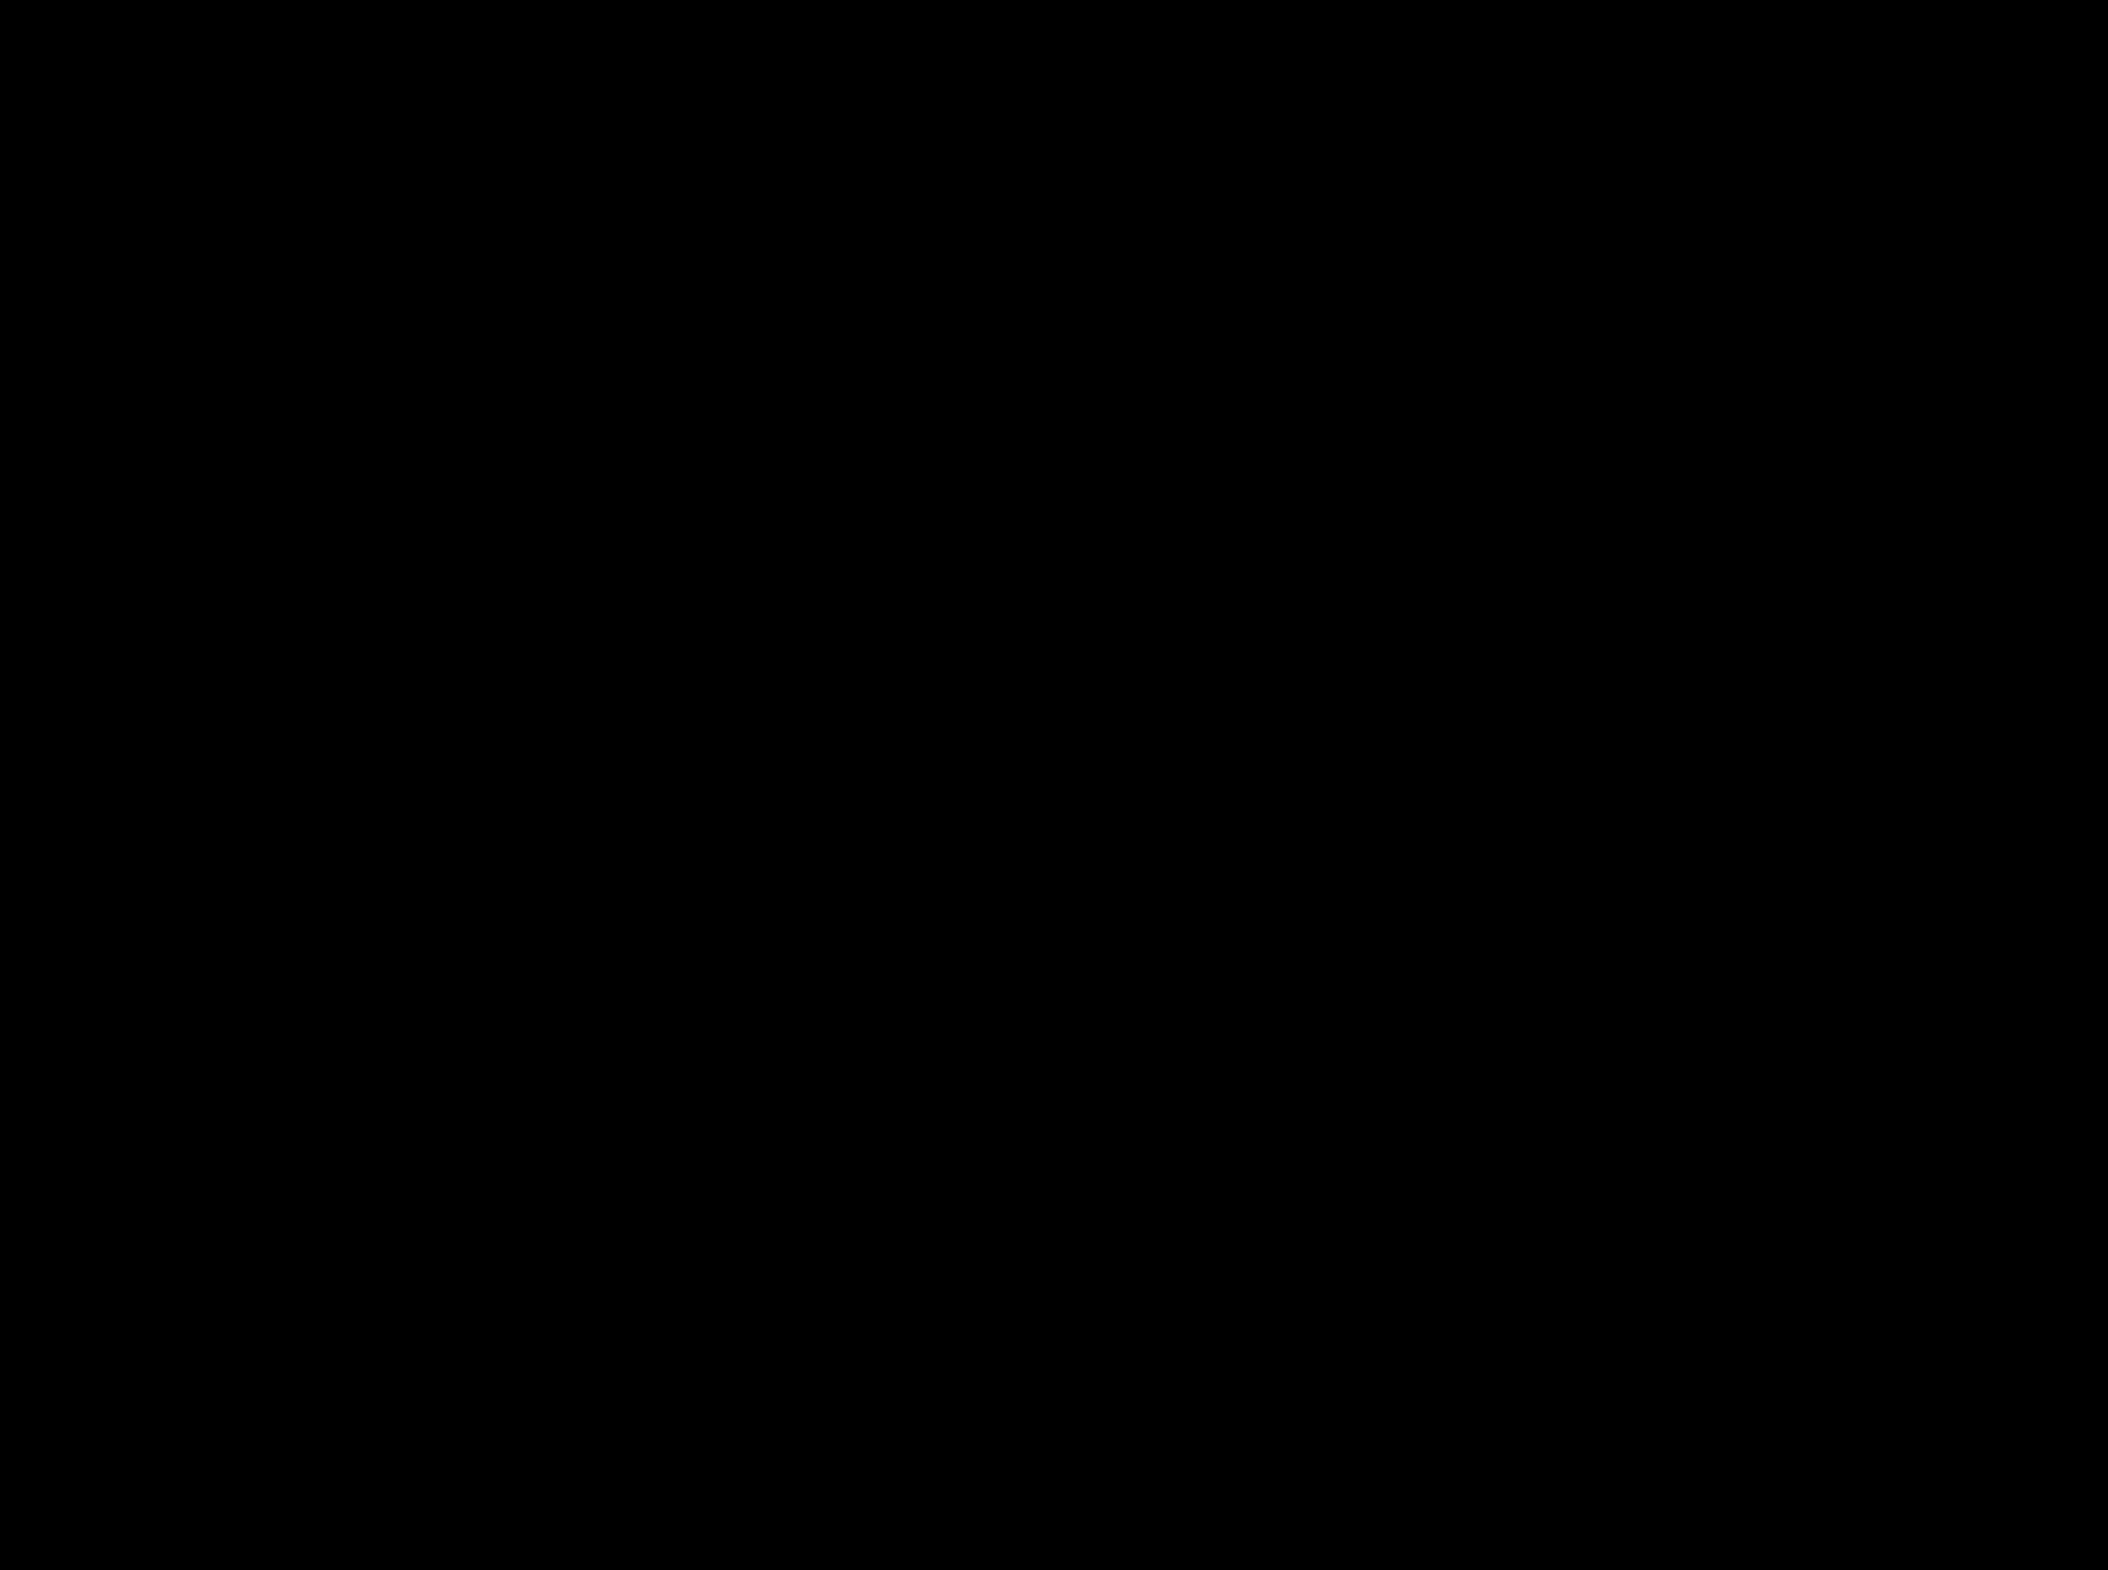 Pojemnik karbowany 2l PS (1,4)